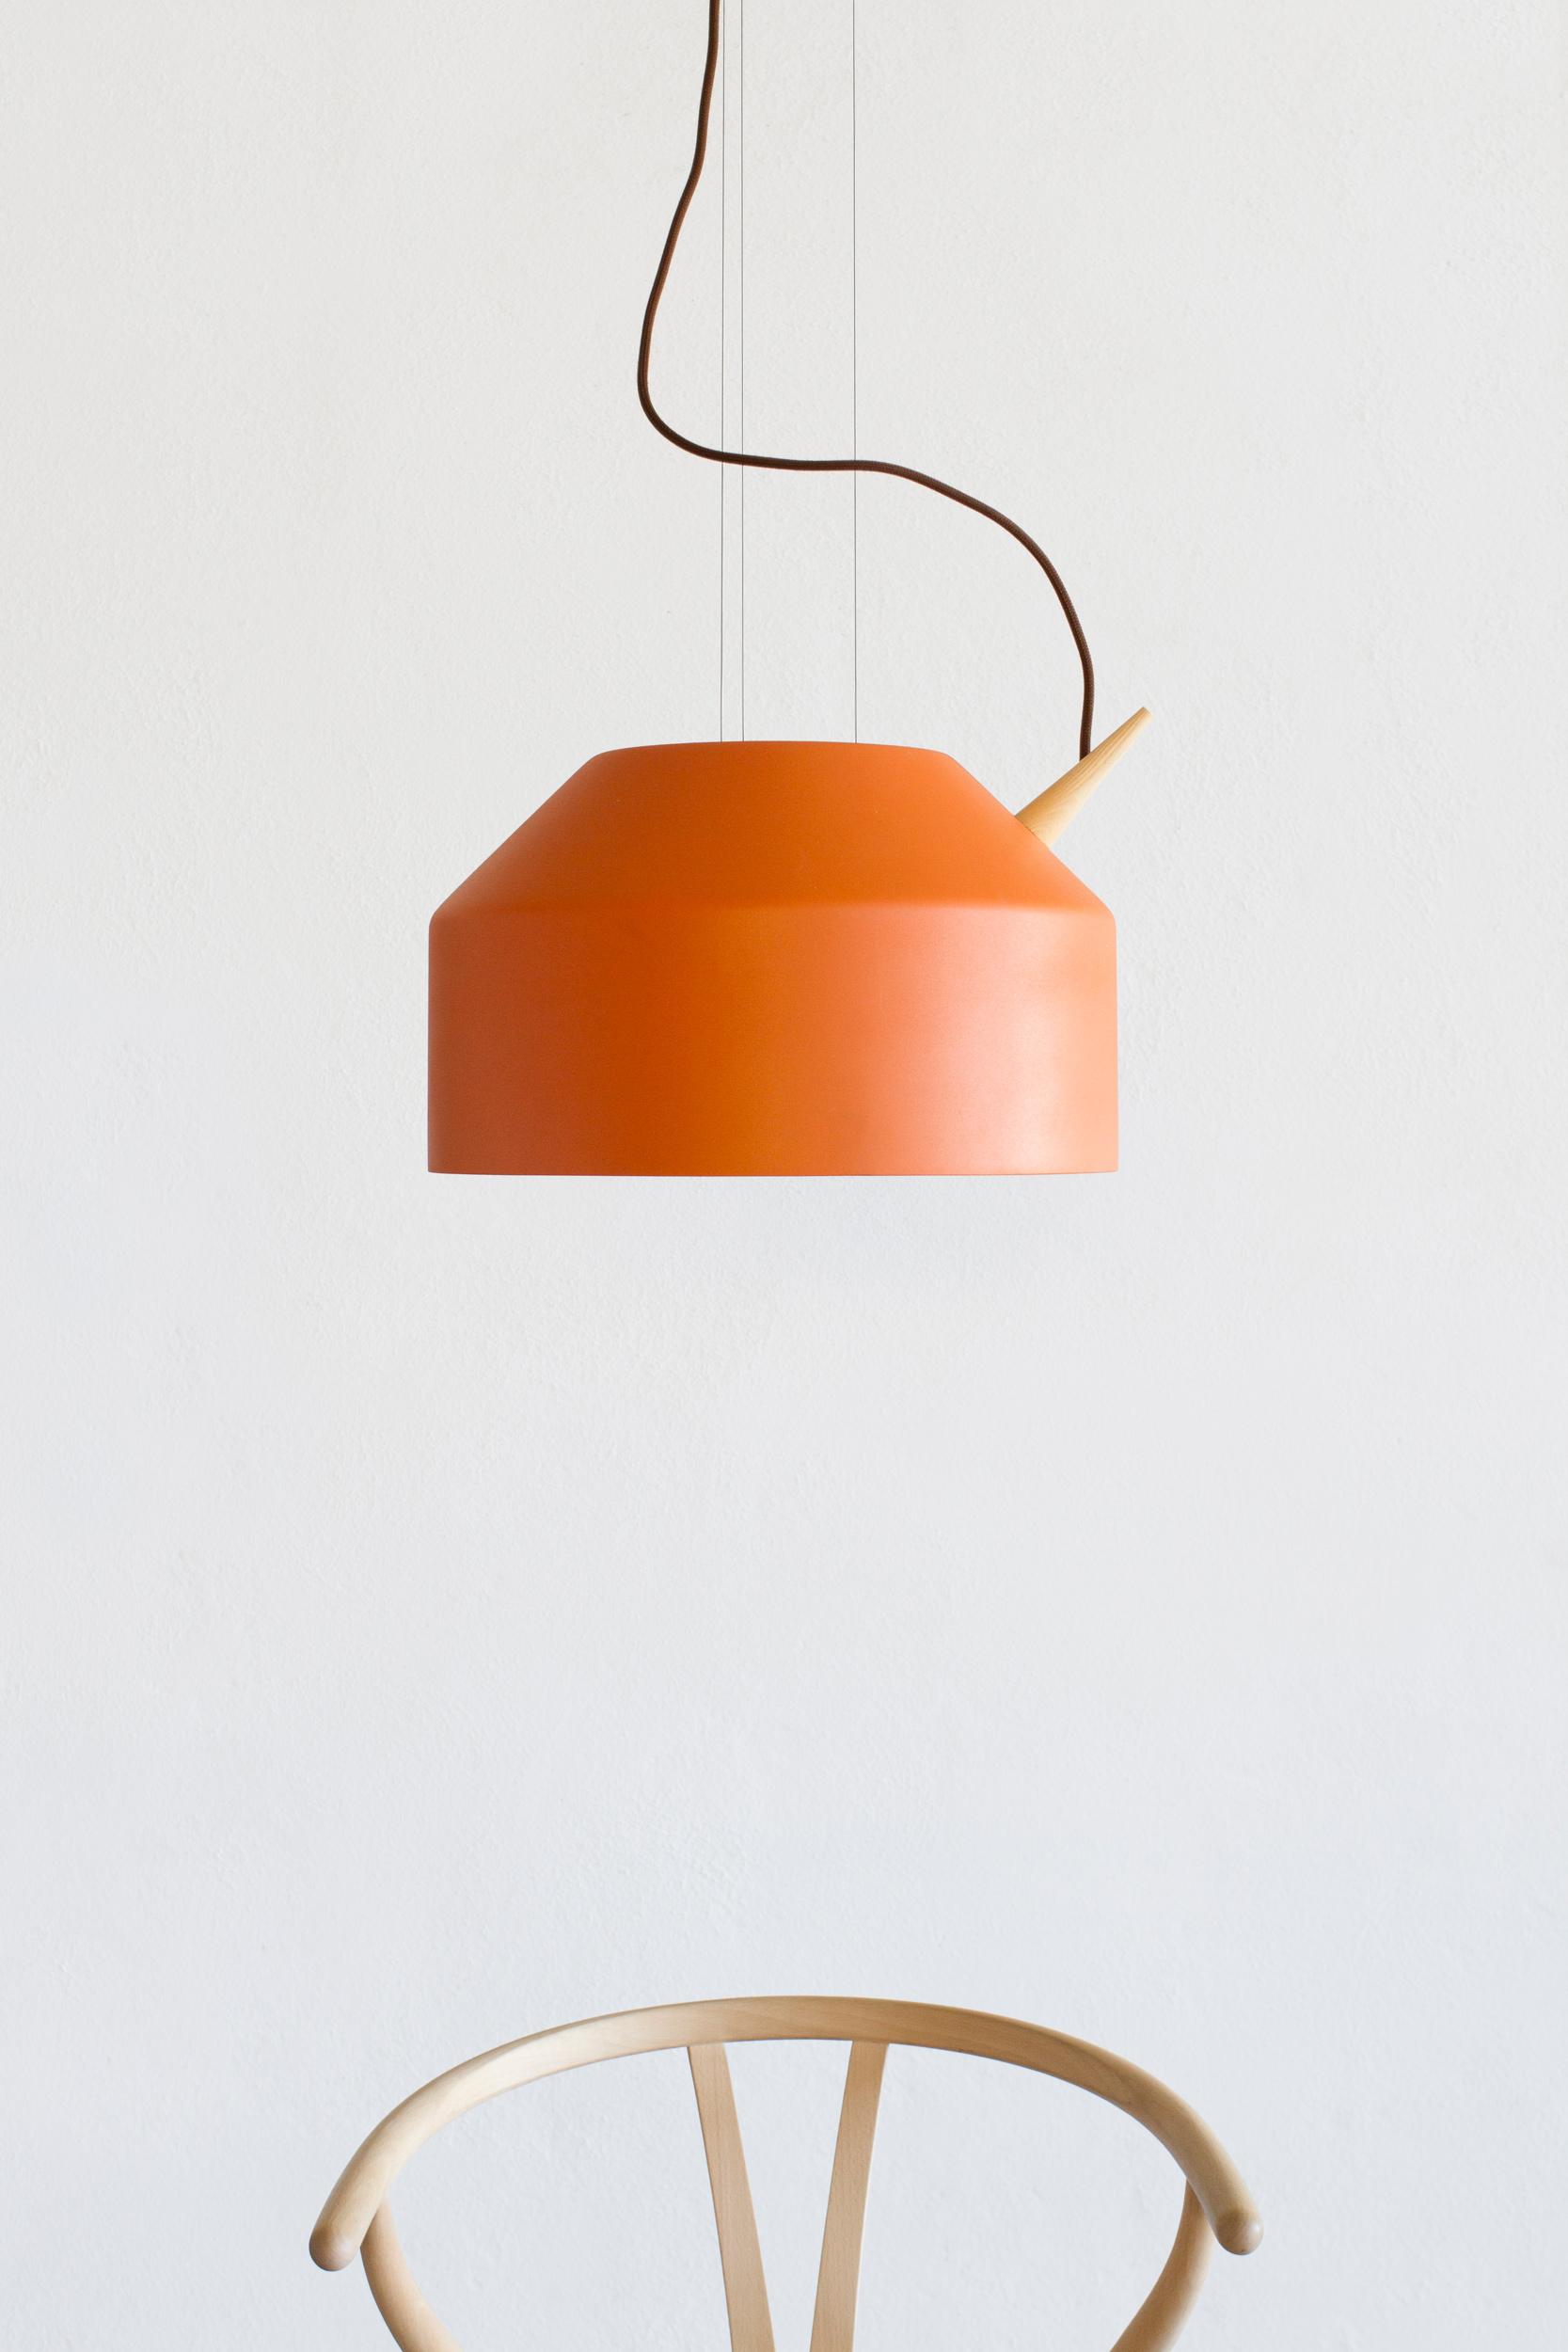 Reeno large i dyp oransje med eik detaljer.